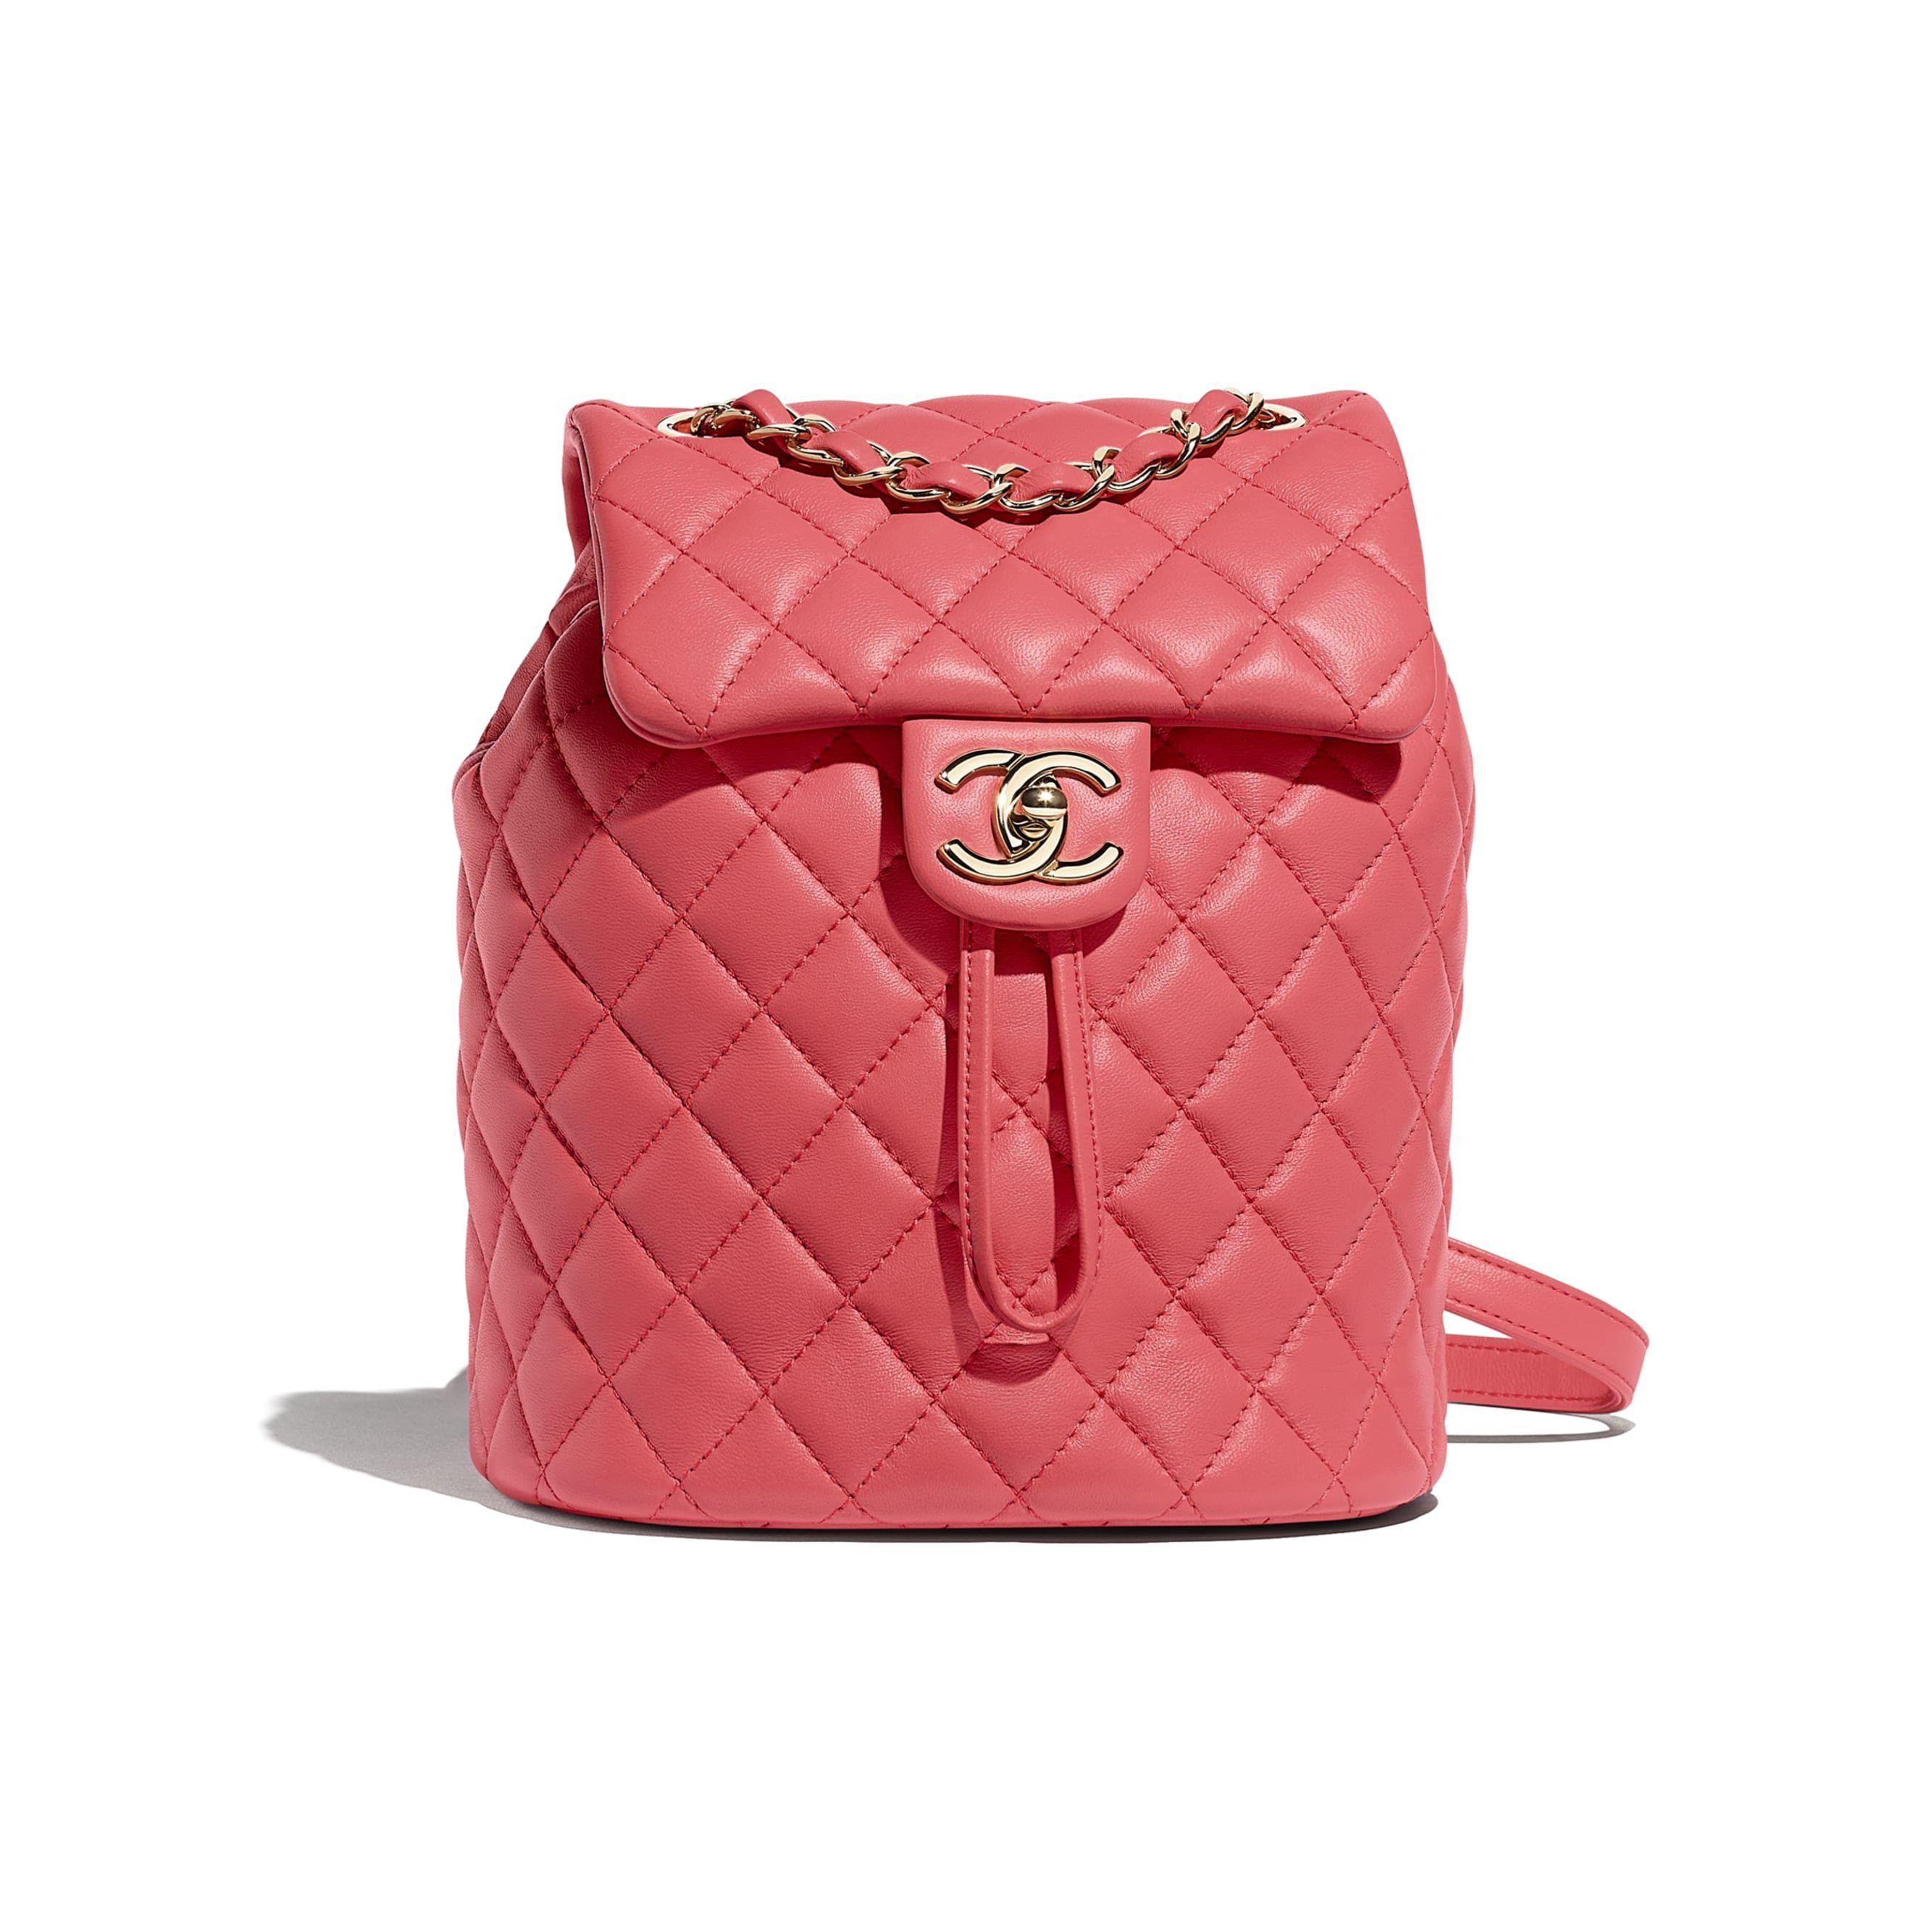 08848c84d9 Lambskin & Gold-Tone Metal Pink Backpack | CHANEL | Handbags ...